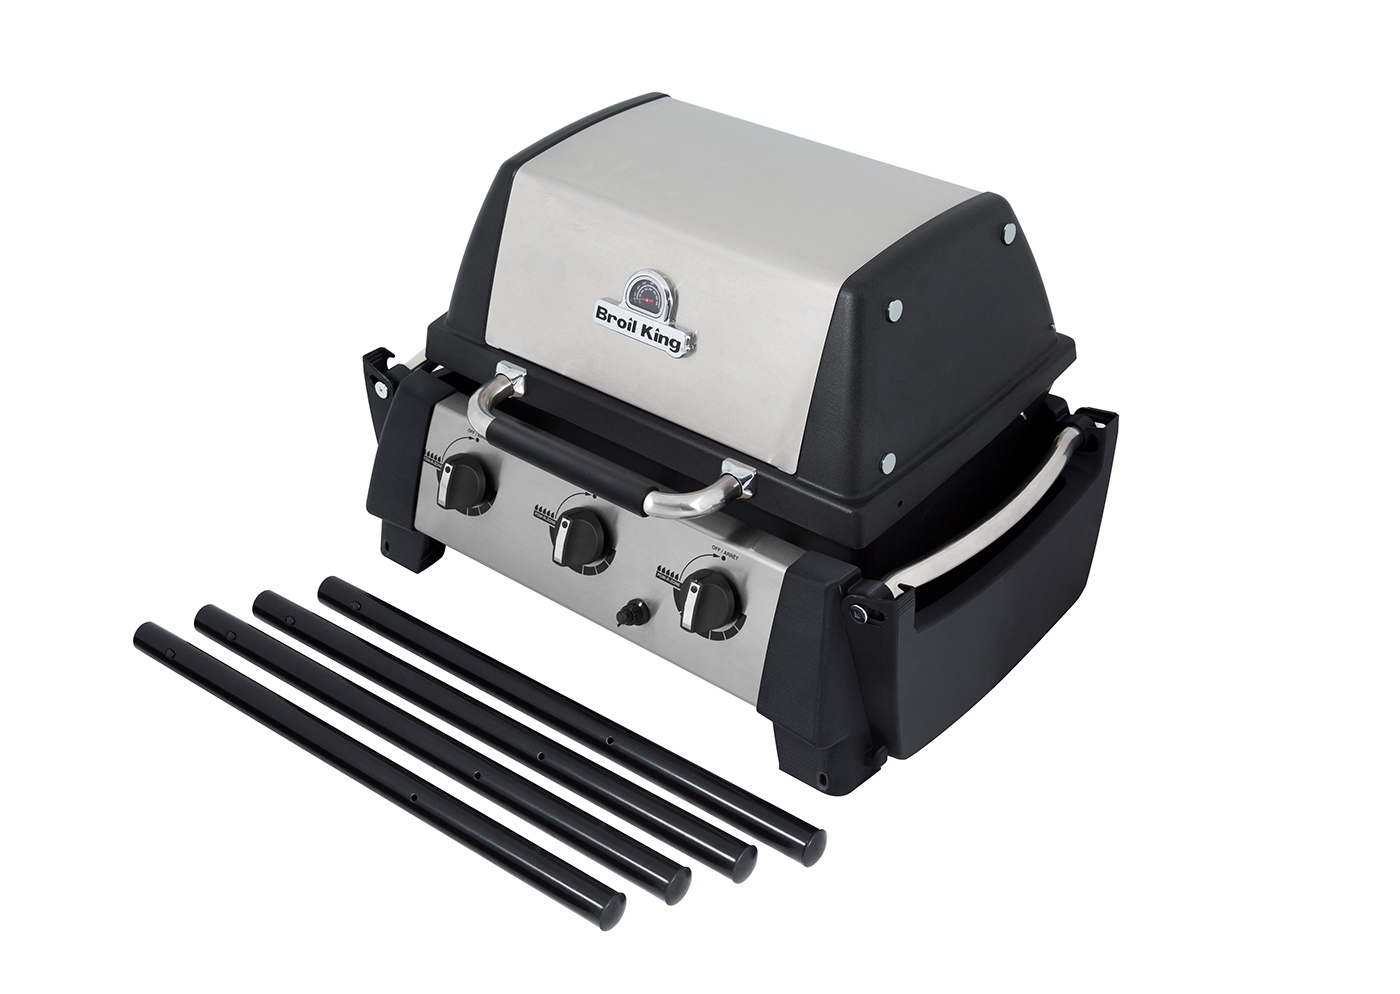 Rösle Gasgrill Porta : Broil king porta chef 320 kaufen neu 2016 gasgrill portabler grill